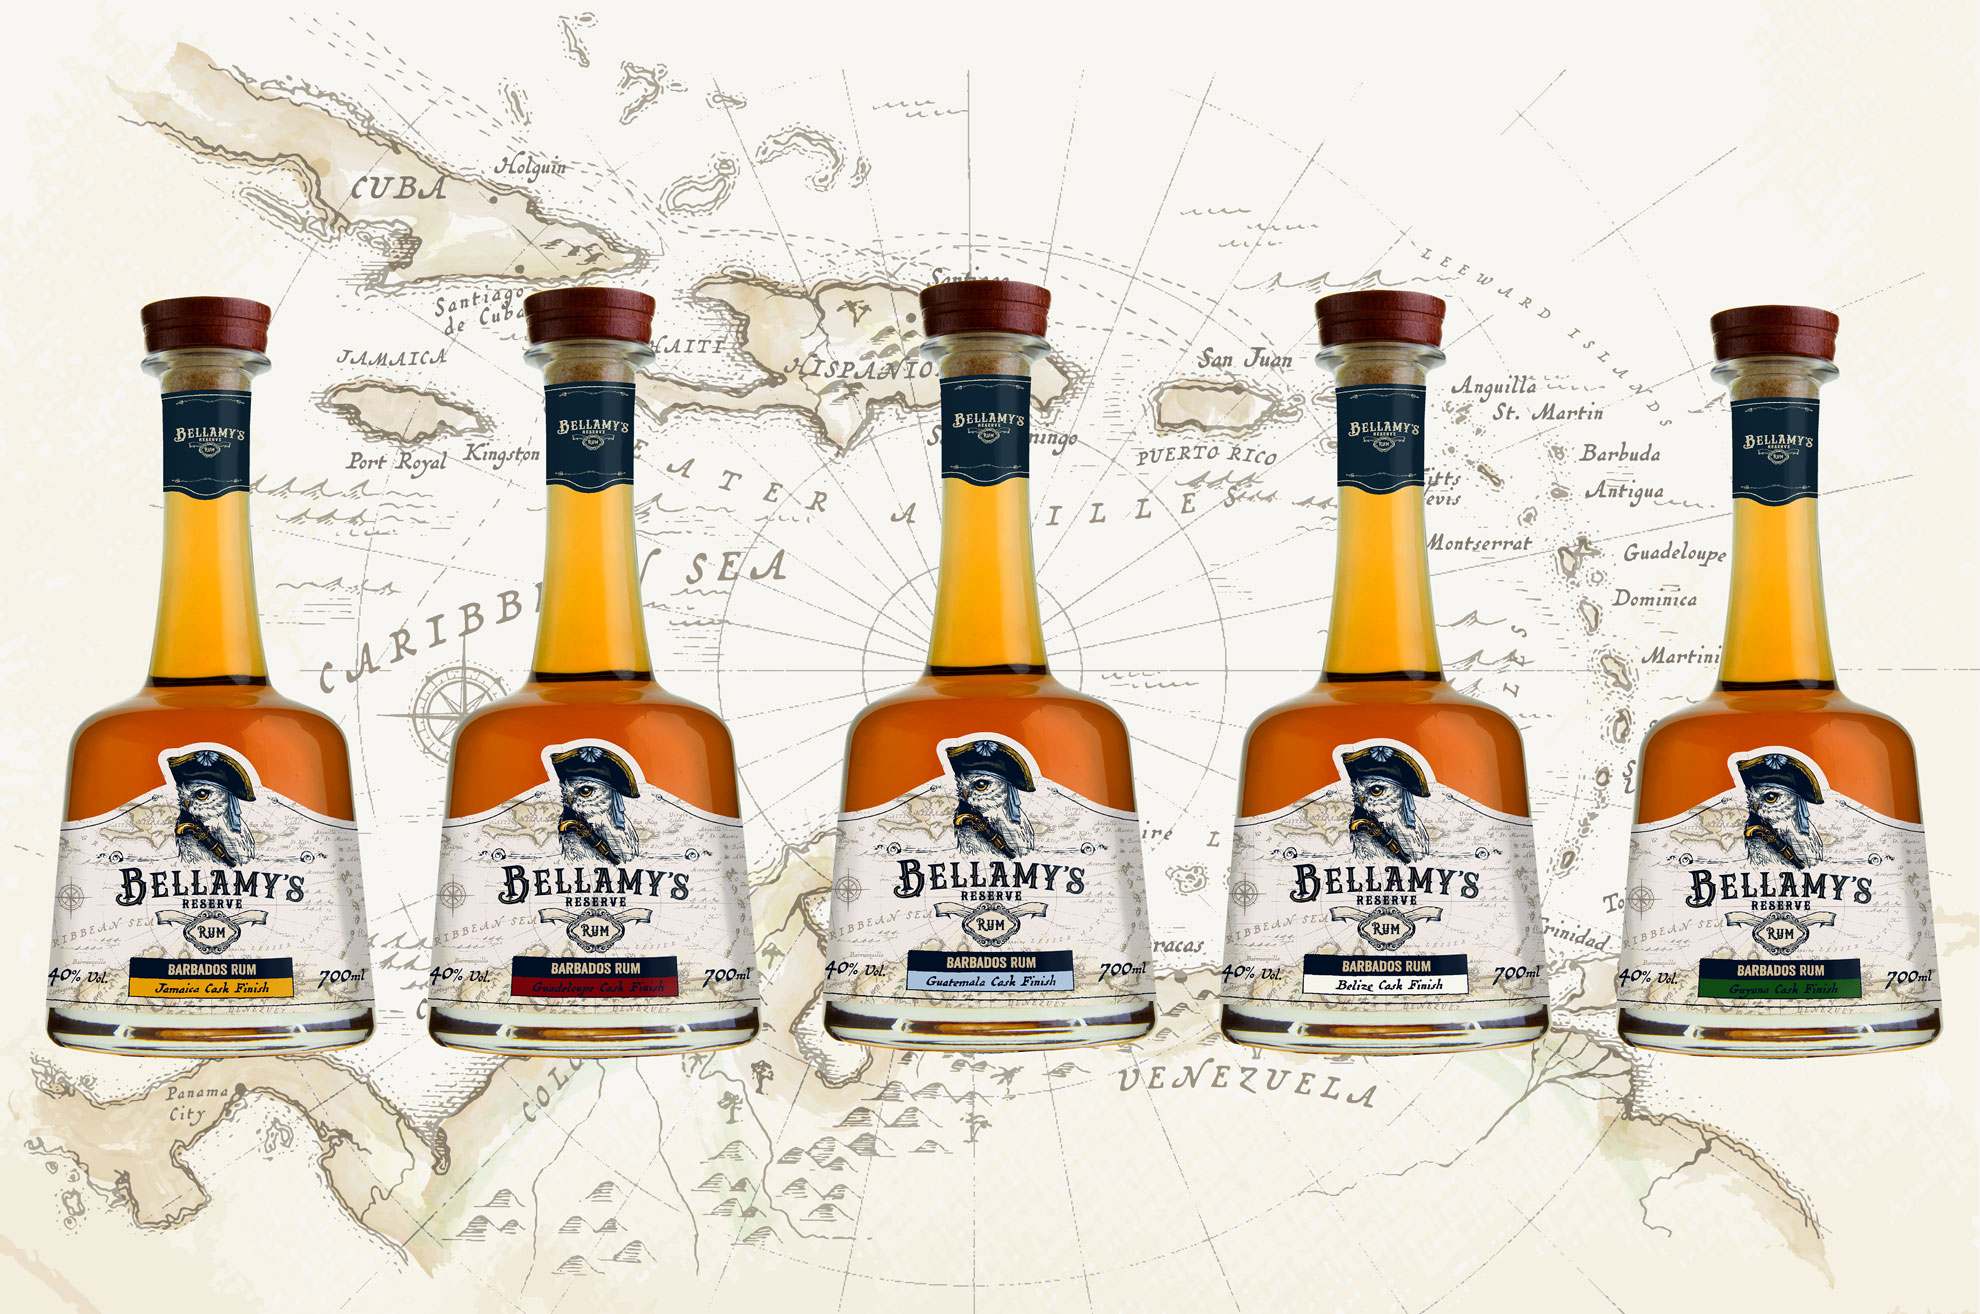 Bellamy's Reserve Rum